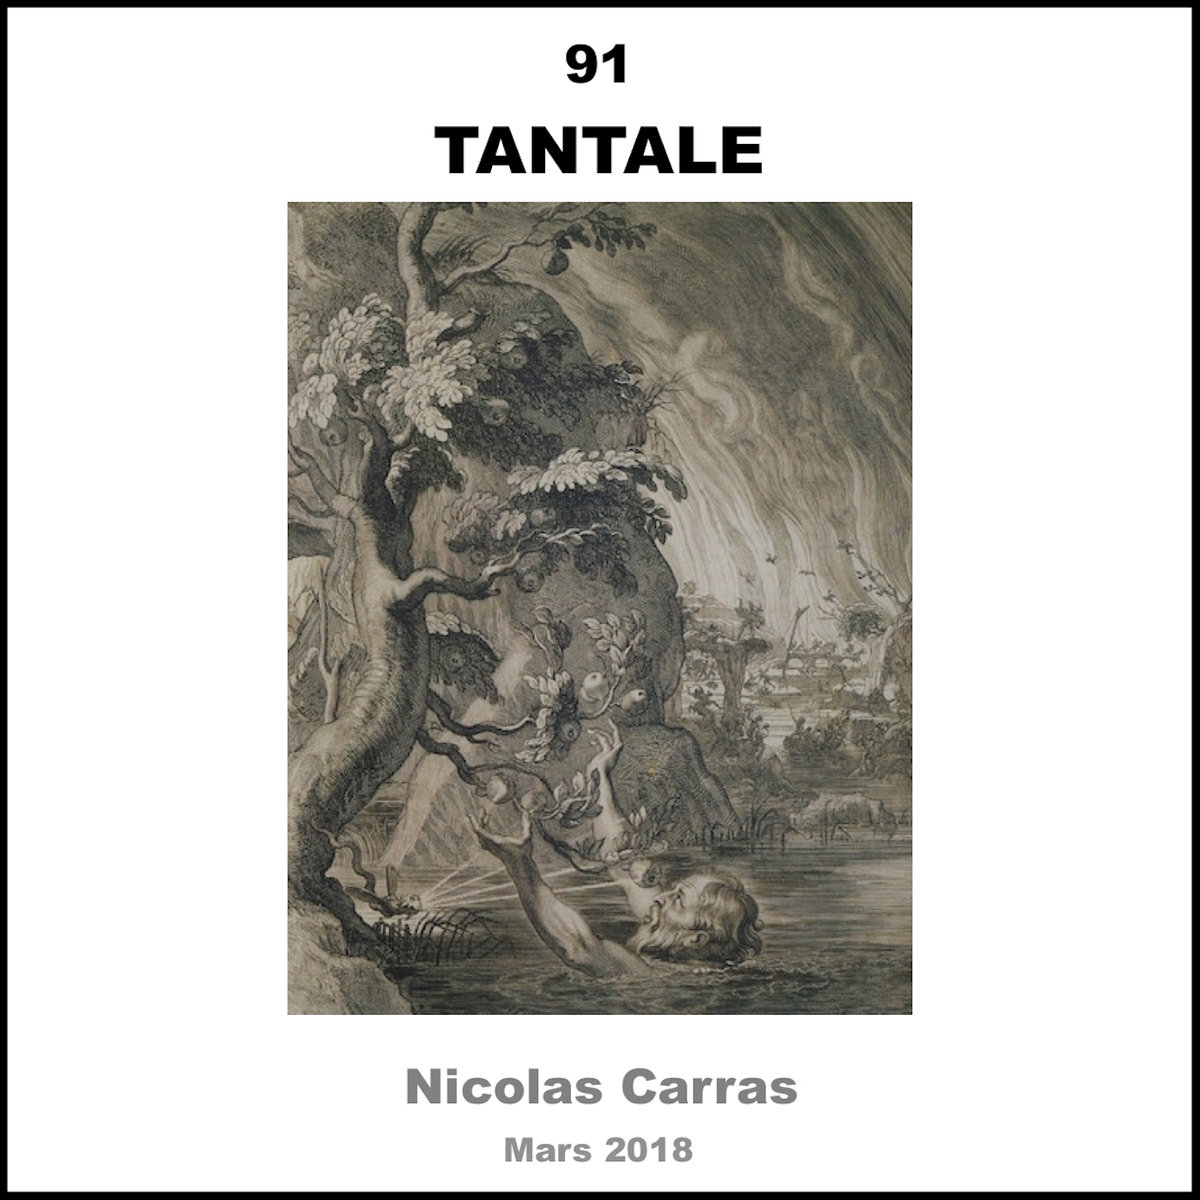 © Nicolas Carras - Tantale